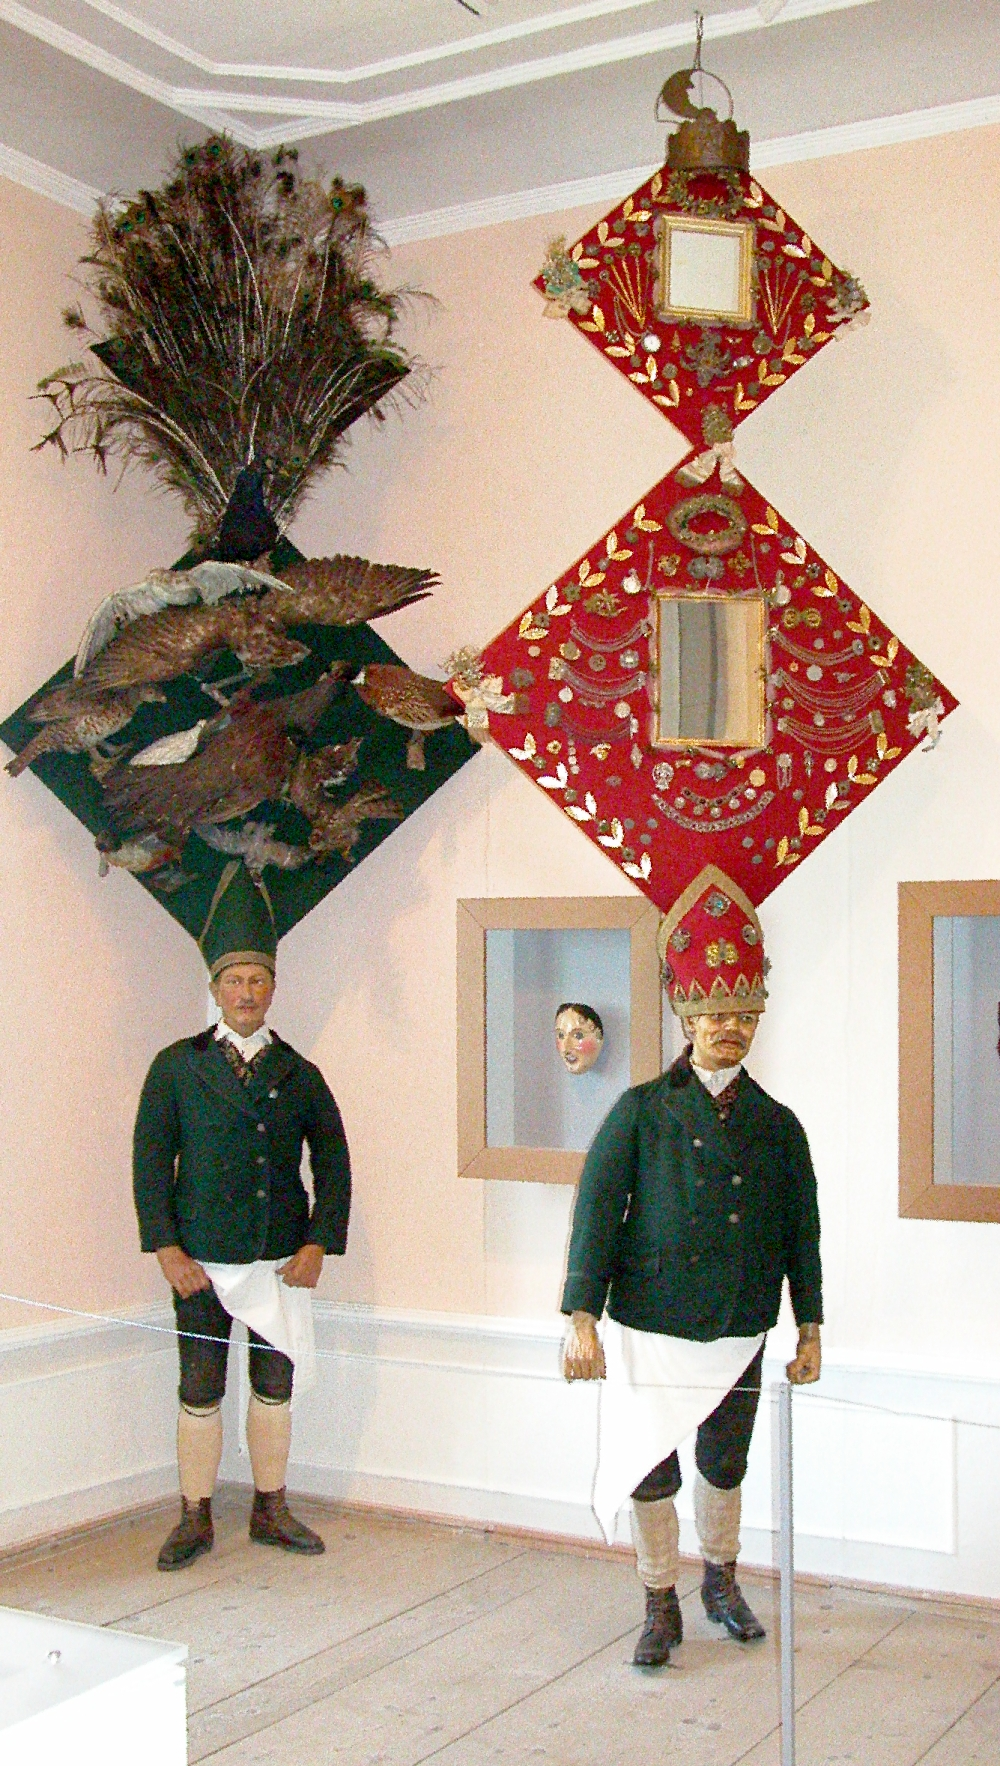 Schönpercht and Vogelprecht - Salzburg ethnological museum